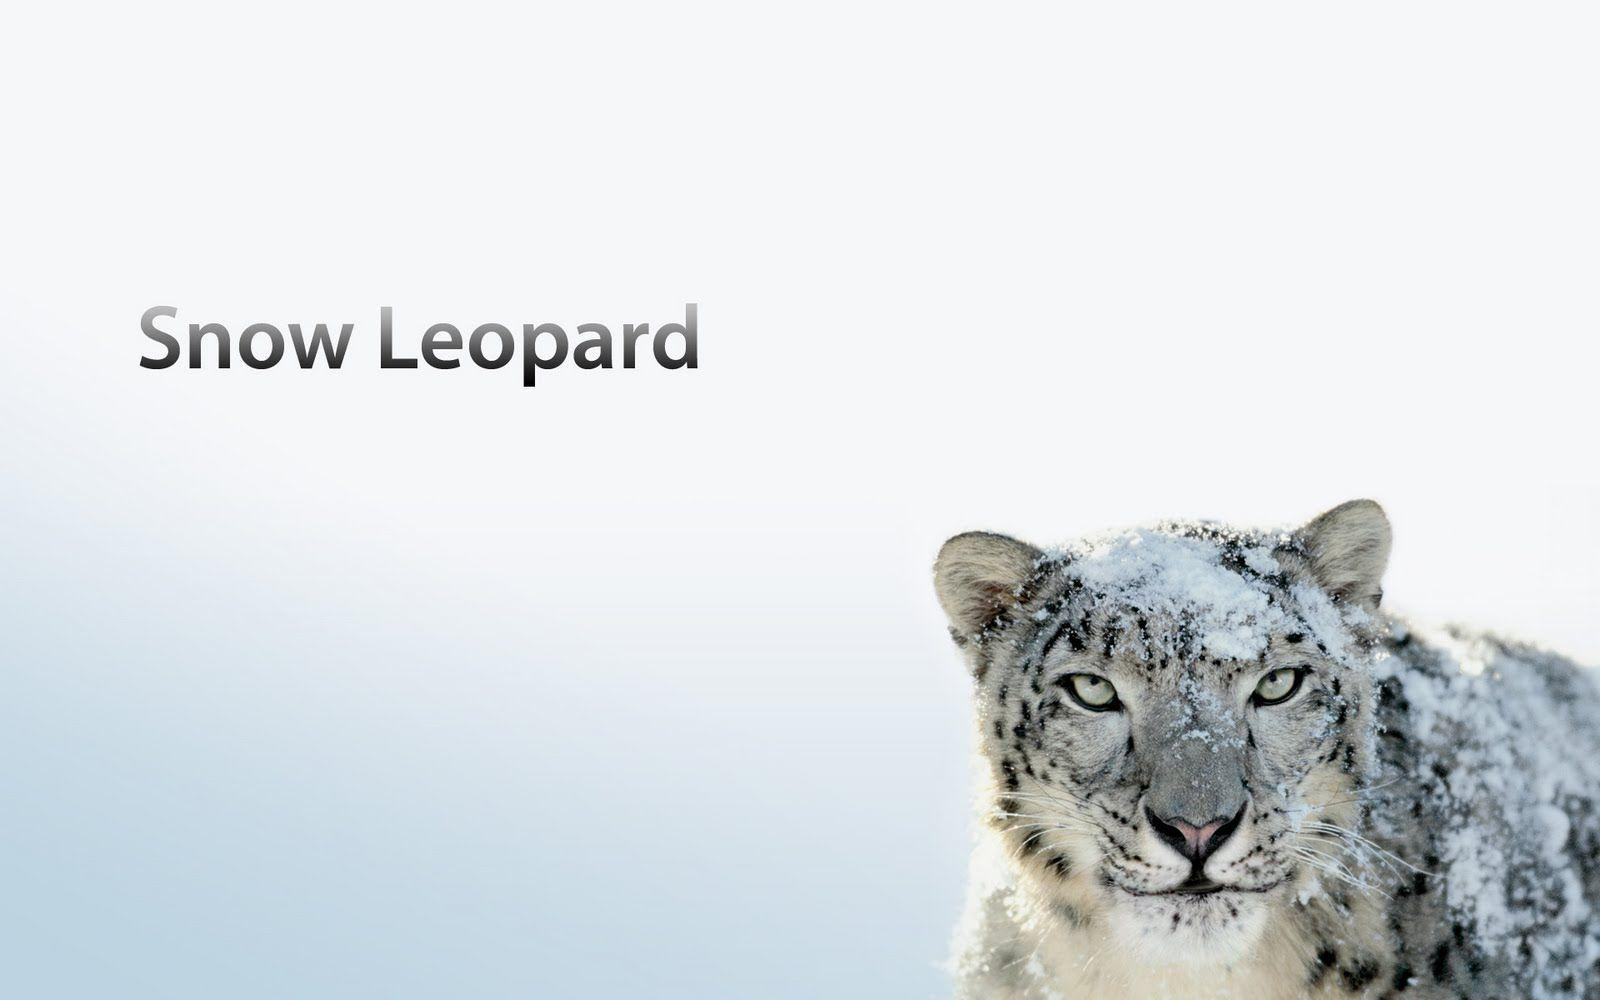 Mac OS X Snow Leopard Wallpapers HD